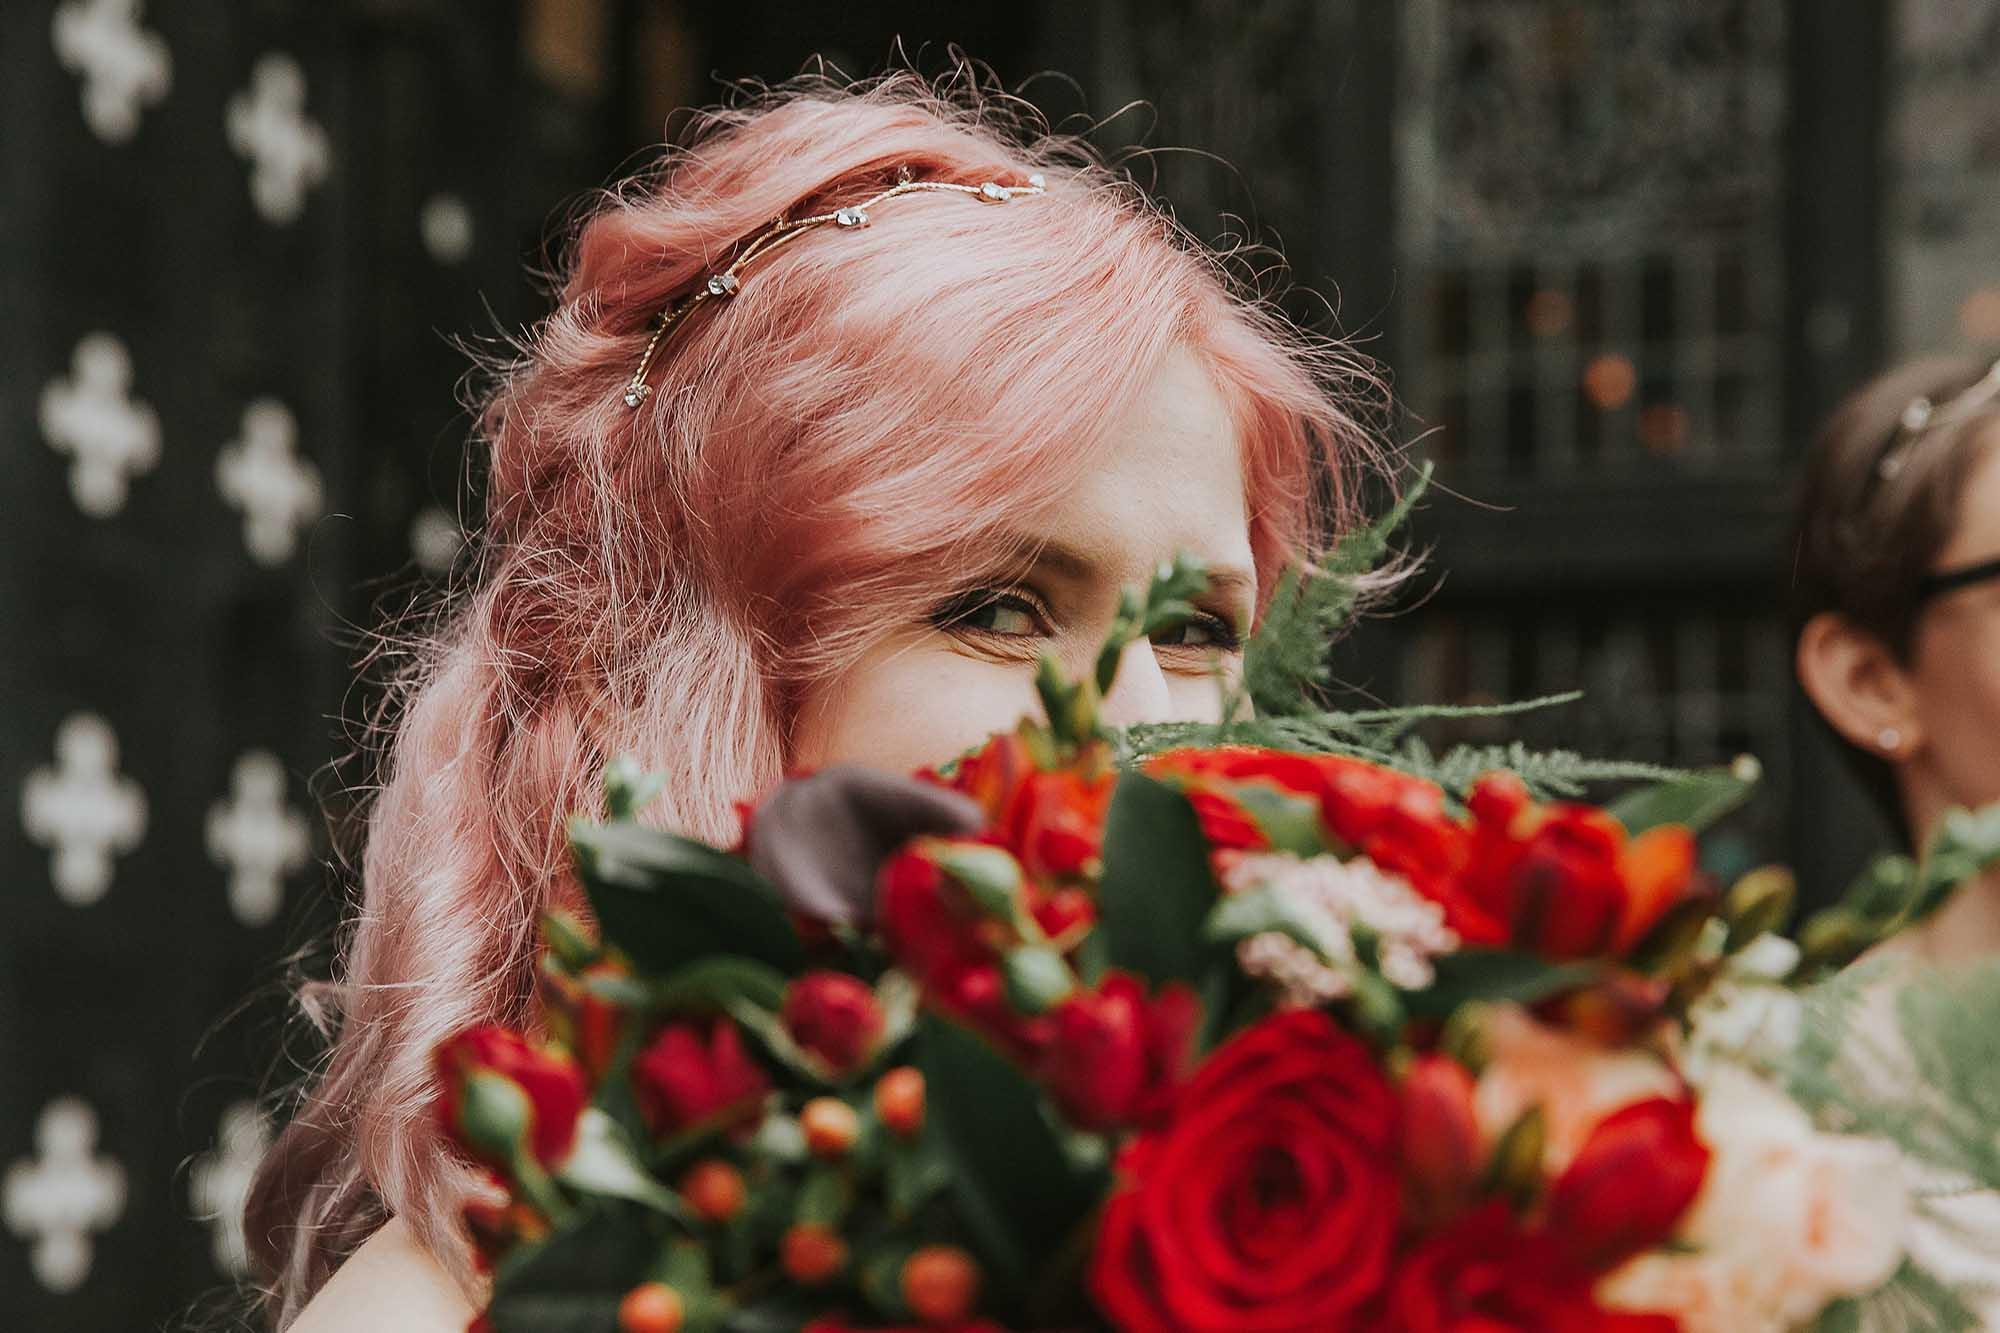 Call me Flower florist